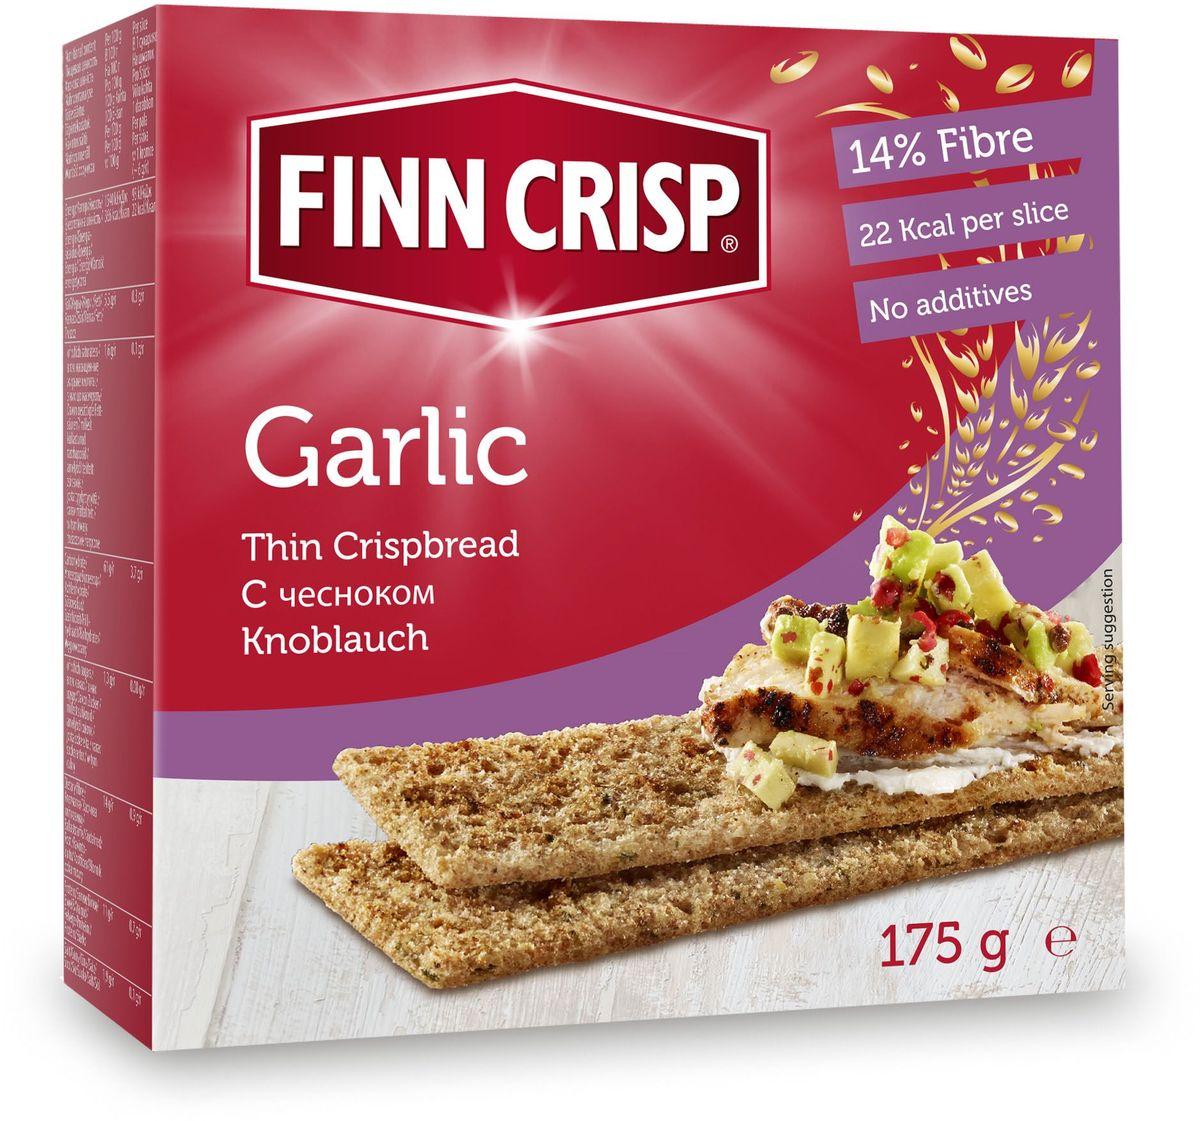 Finn Crisp Garlic хлебцы с чесноком, 175 г finn crisp traditional хлебцы традиционные 200 г